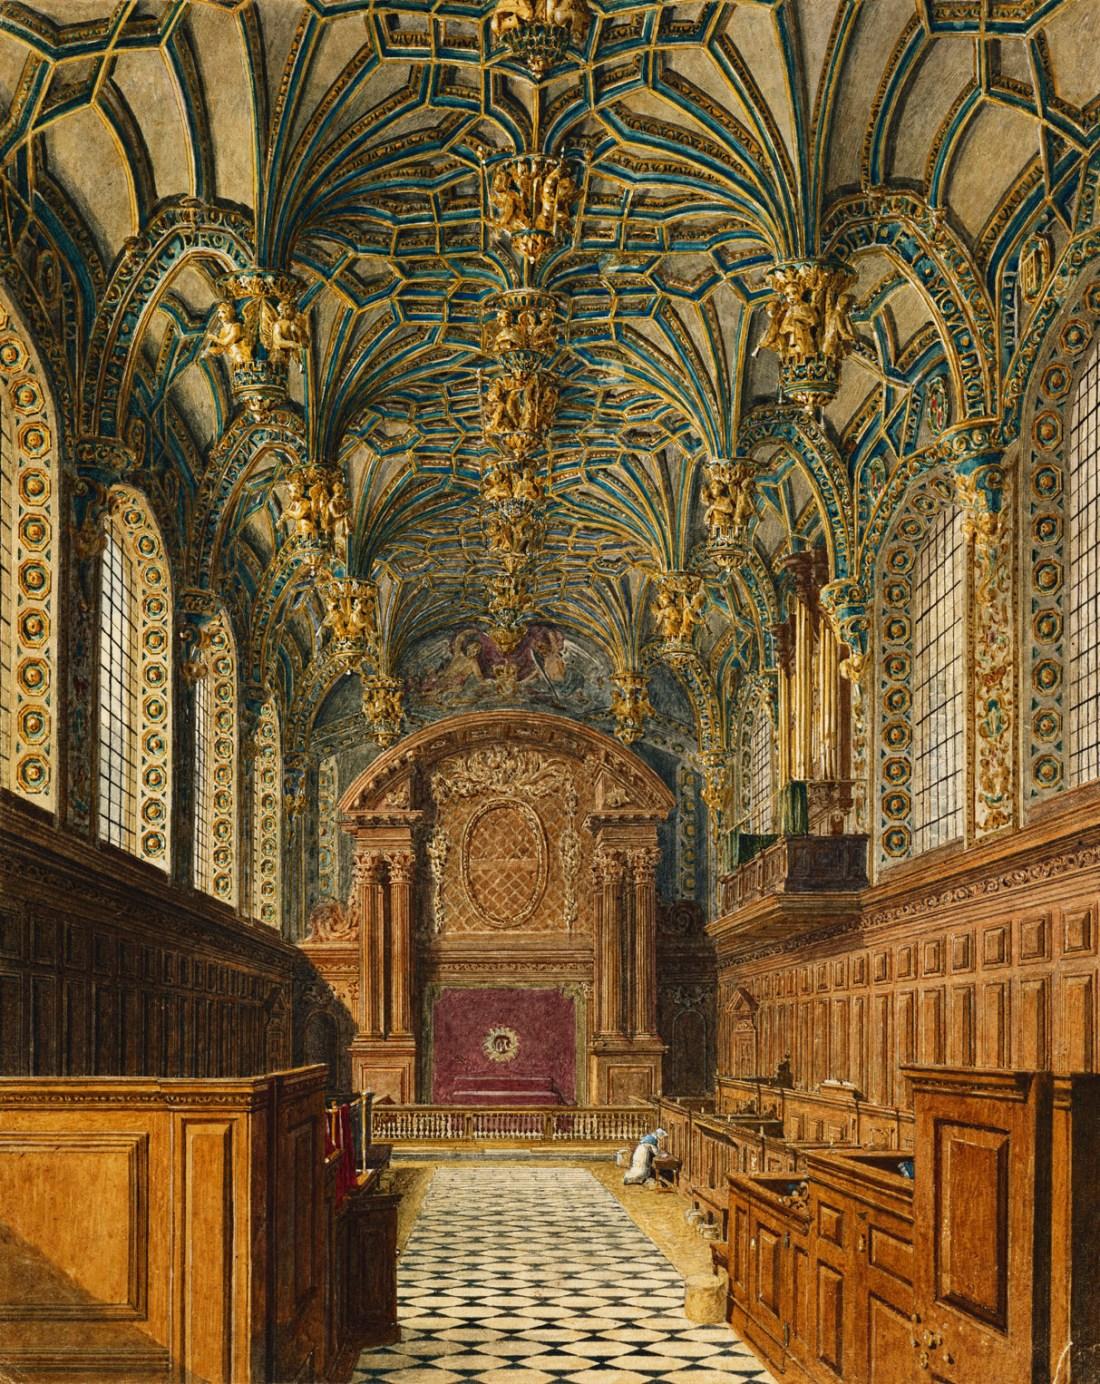 Hampton_Court_Palace,_Chapel,_by_Charles_Wild,_1819_-_royal_coll_922125_313698_ORI_2